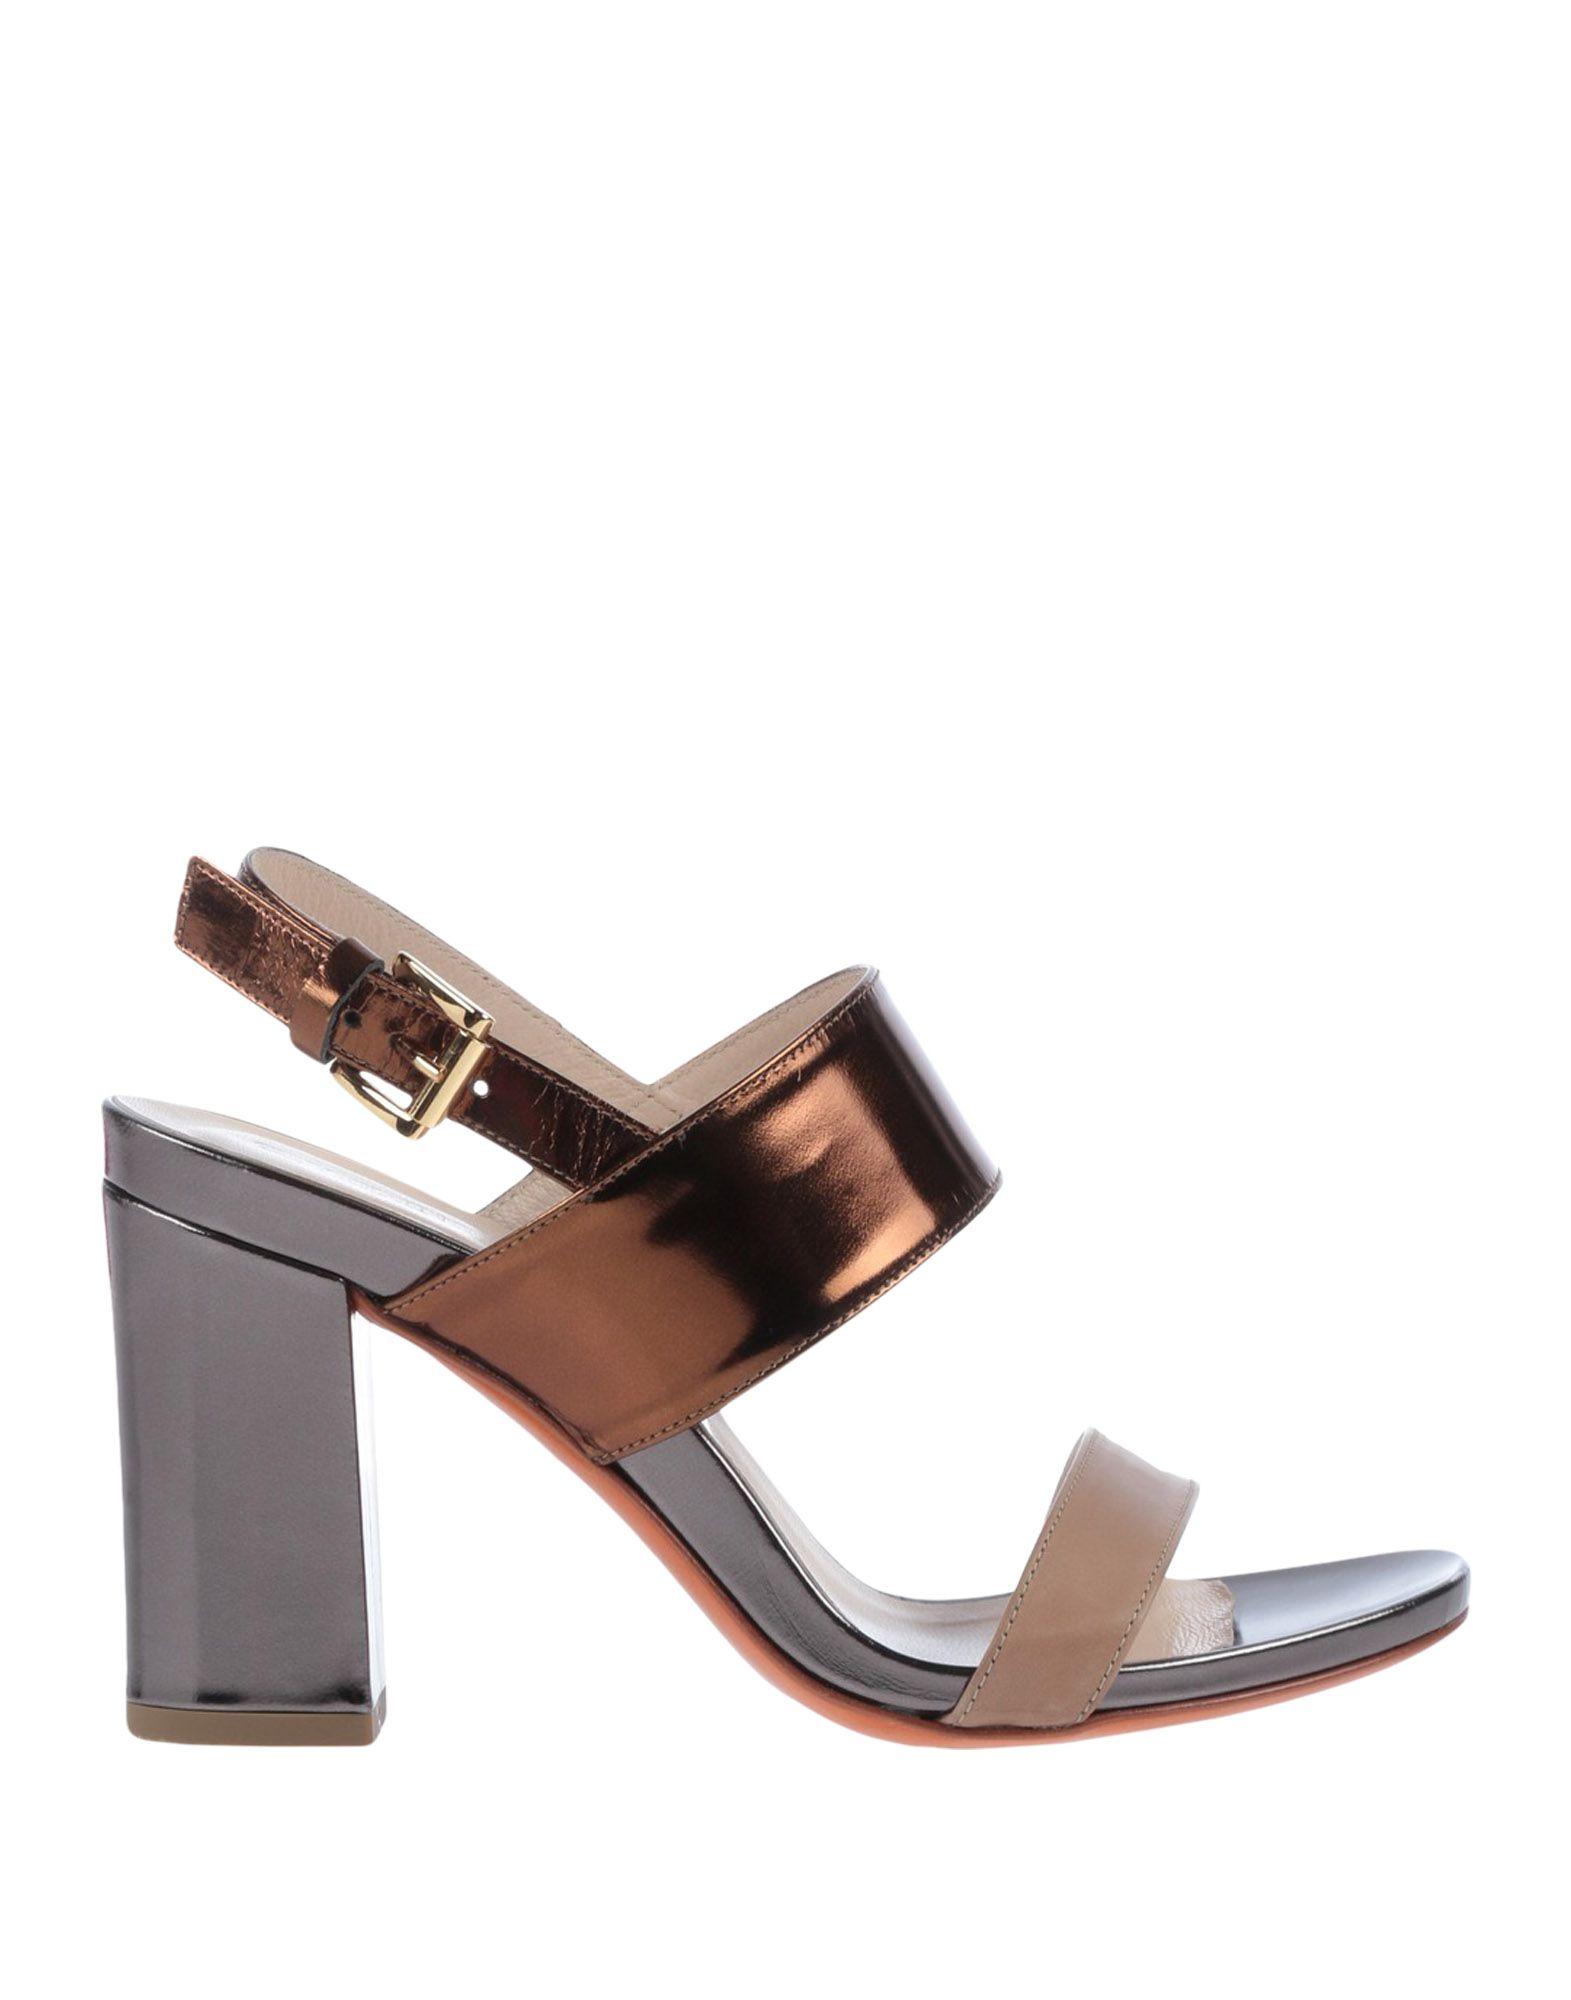 CIVIDINI Sandals in Bronze